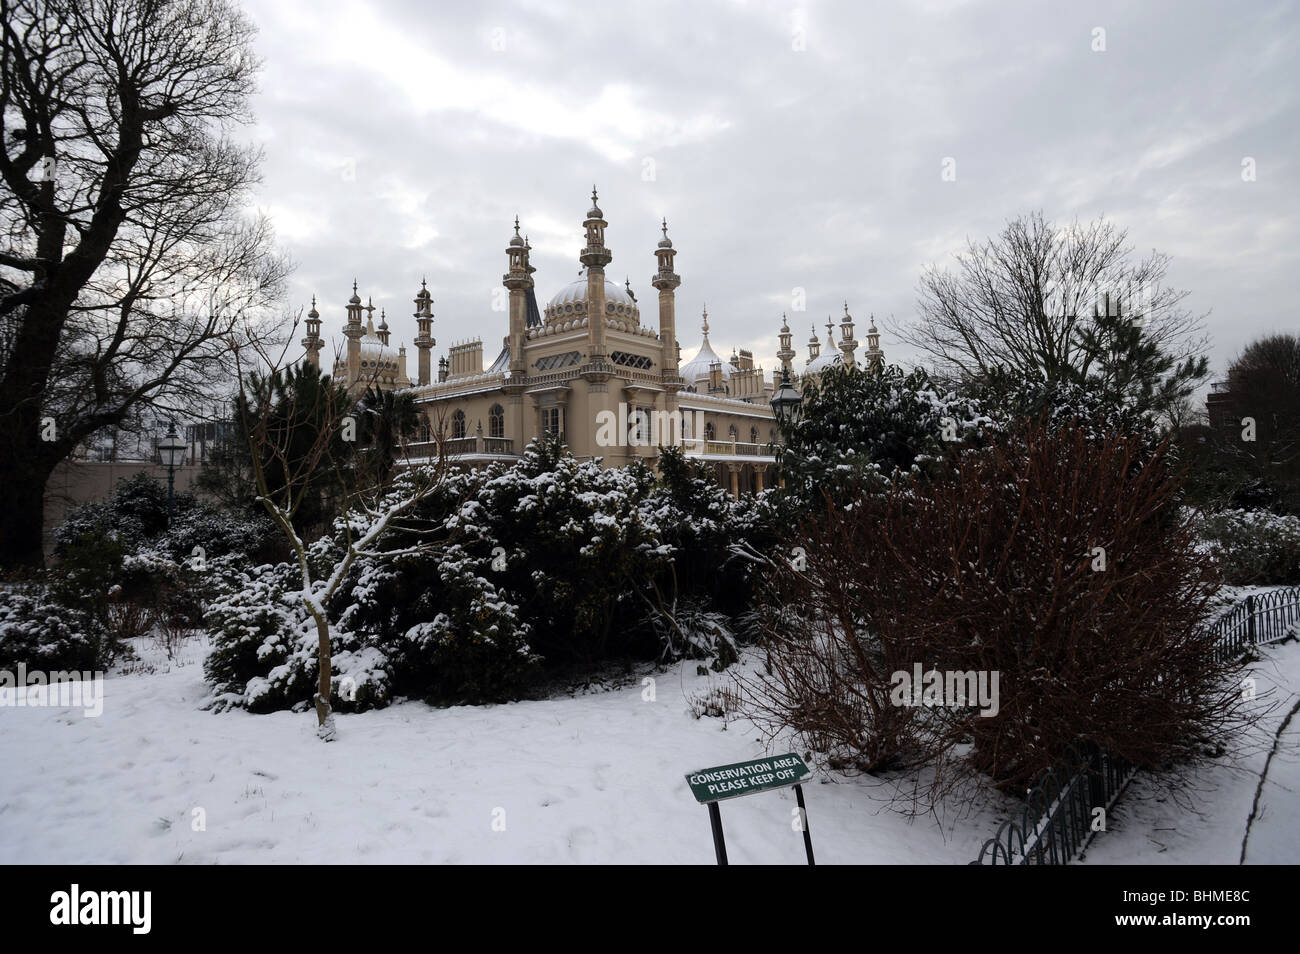 The royal pavilion brighton in the snow Stock Photo